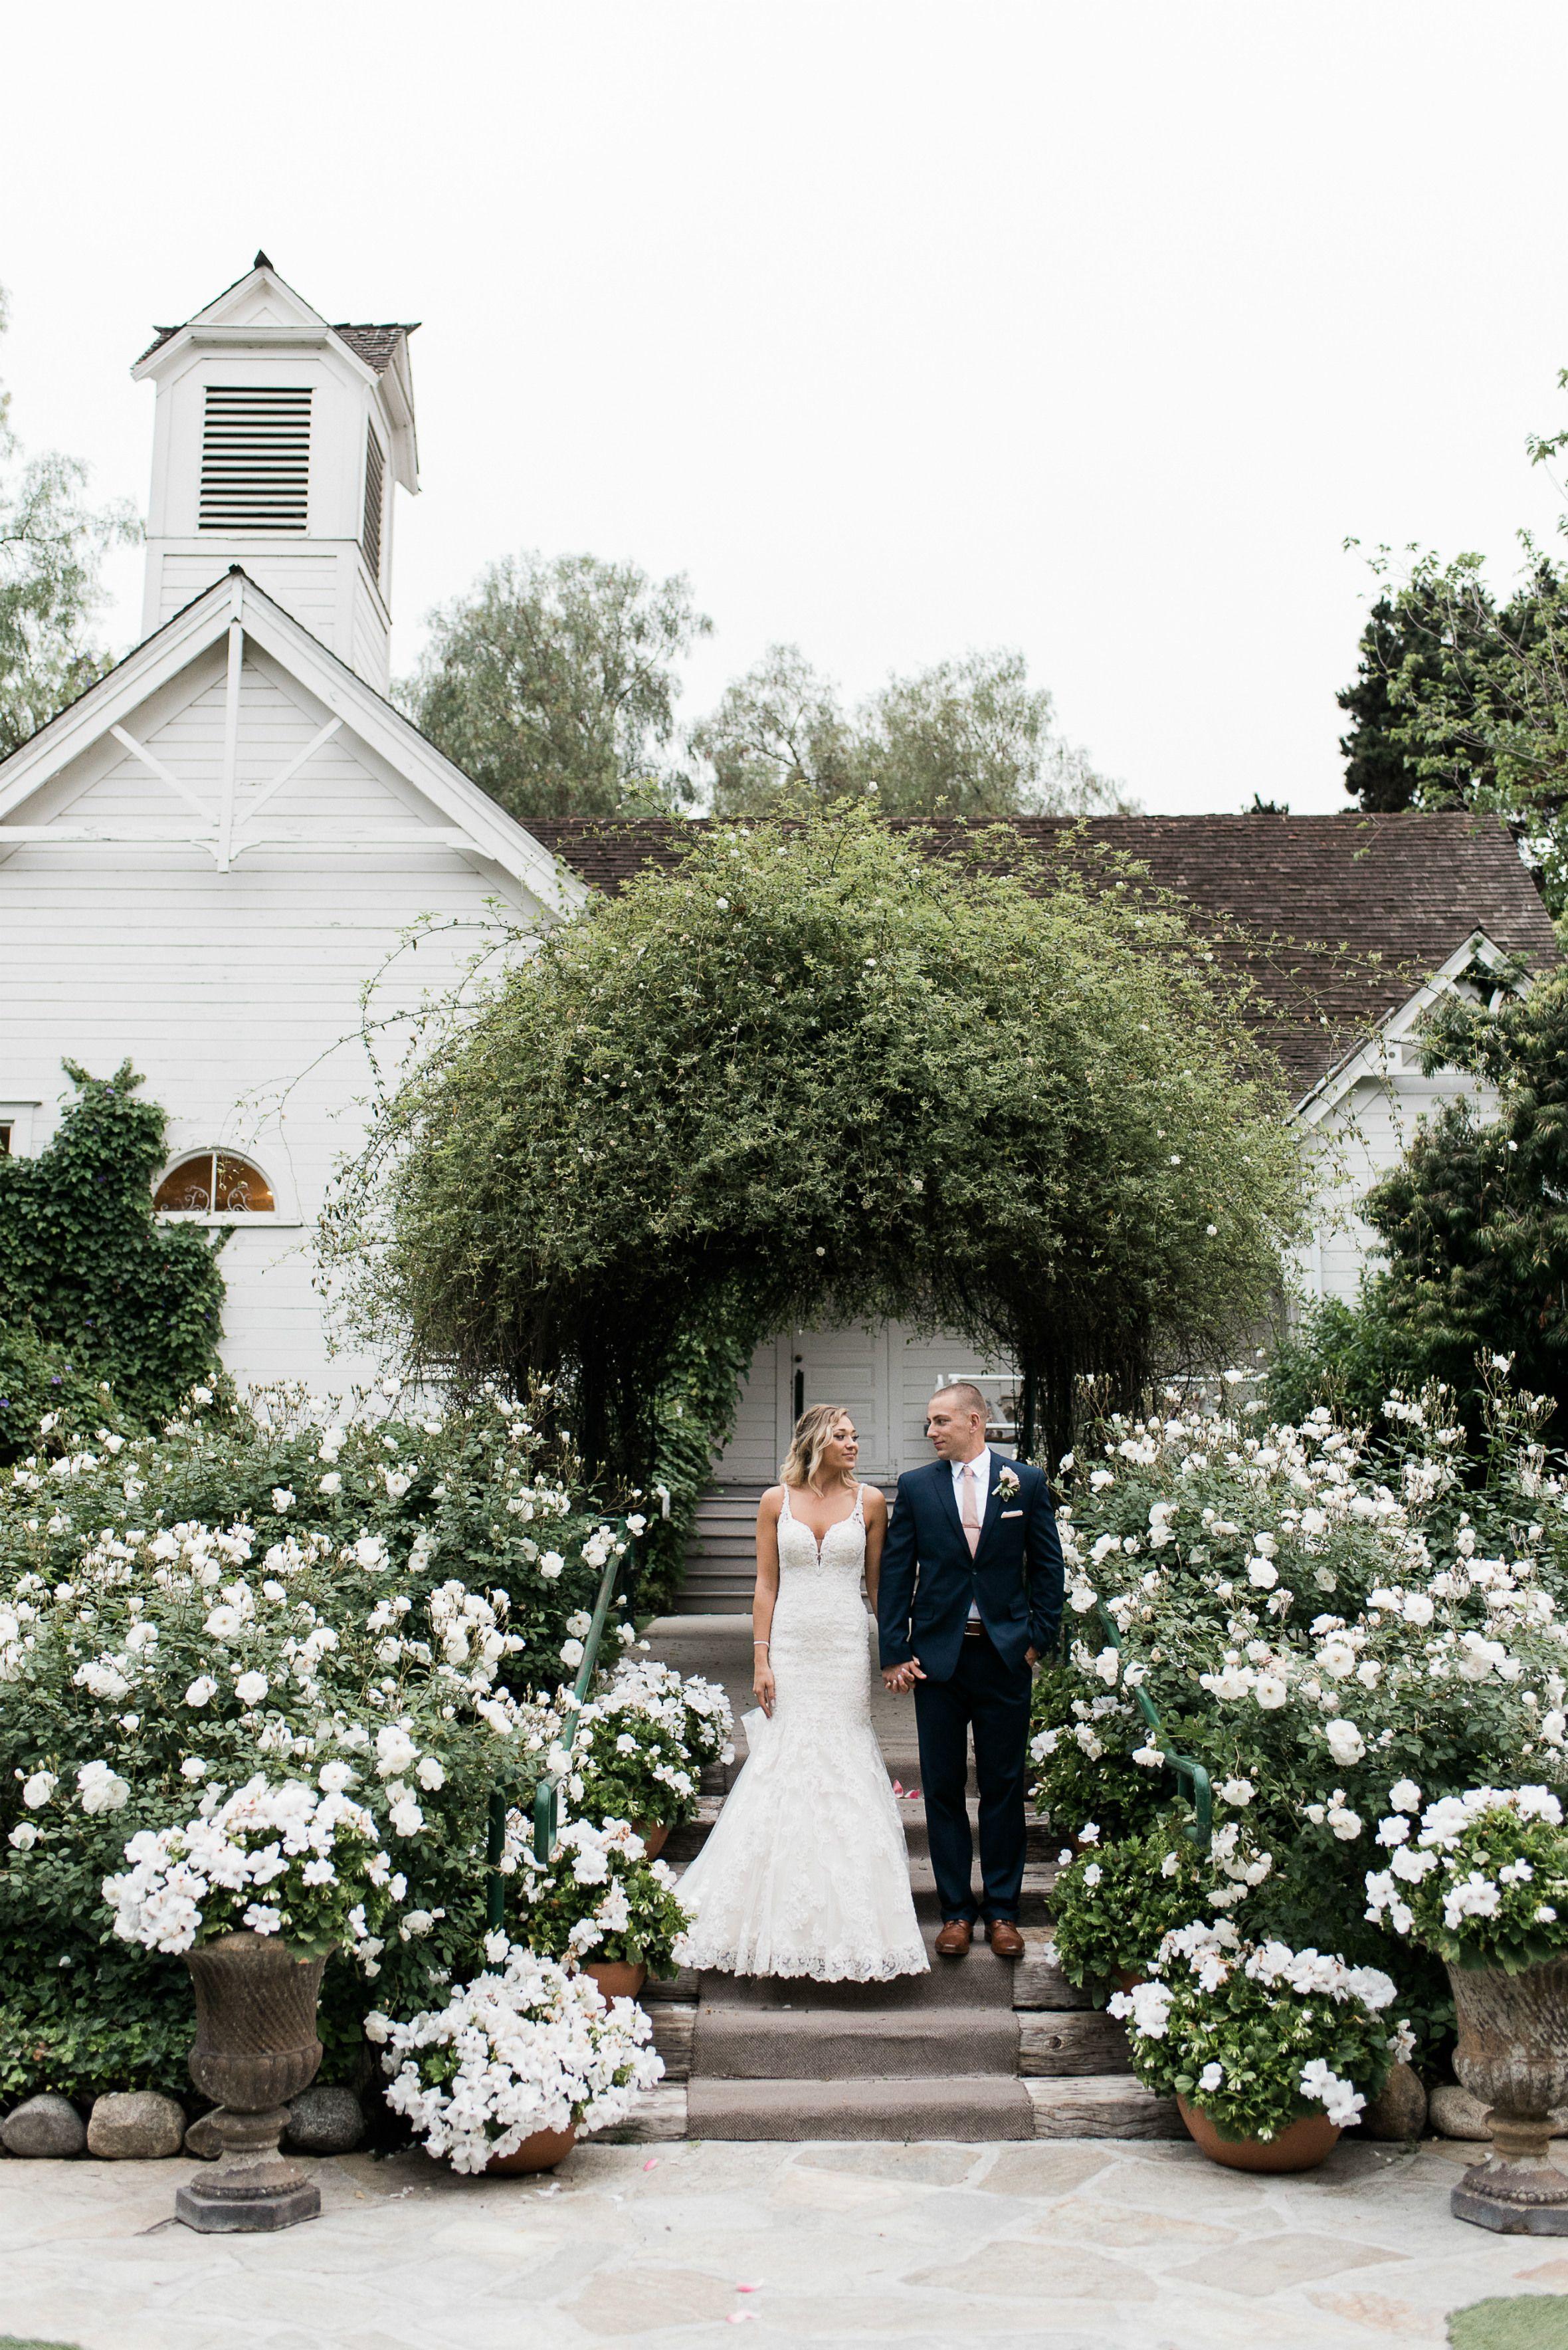 Classic Sweethearts Vintage Schoolhouse Timeless Greengables Greengablesweddingestate Greeng Green Gables Wedding Estate Wedding Modern Outdoor Wedding